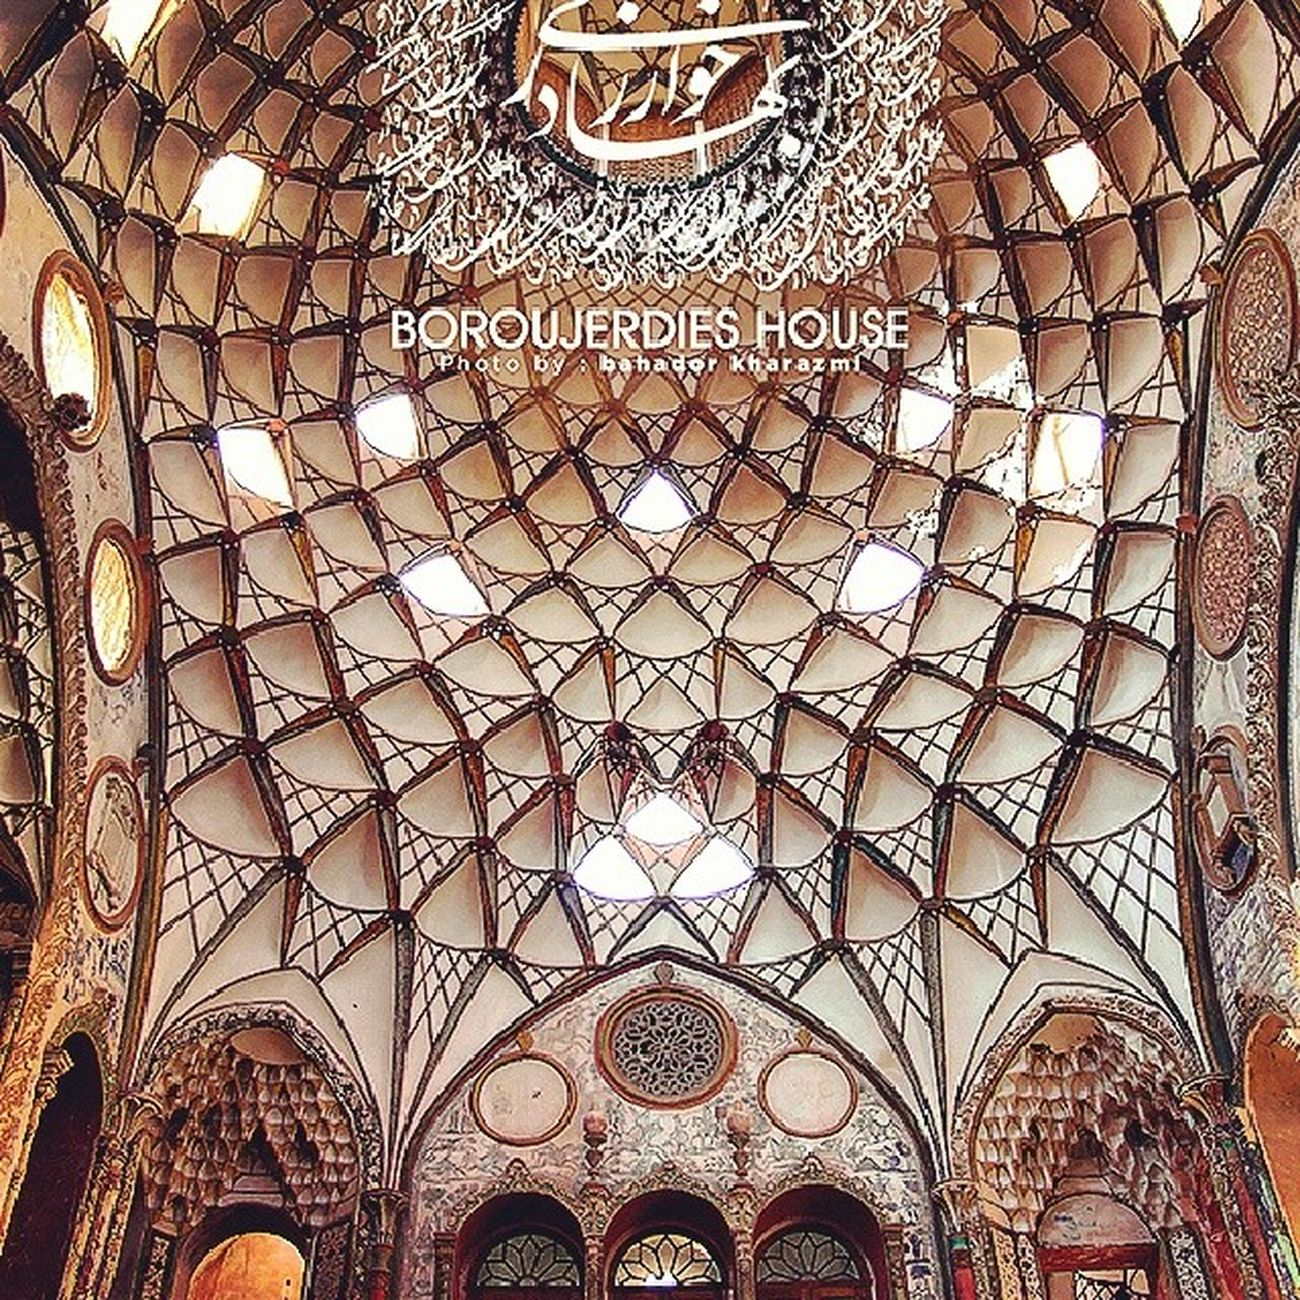 Iran Kashan House Boroujerdi boroojerdi architecture art arc mason persian persia Islamic islam islamism_architecture